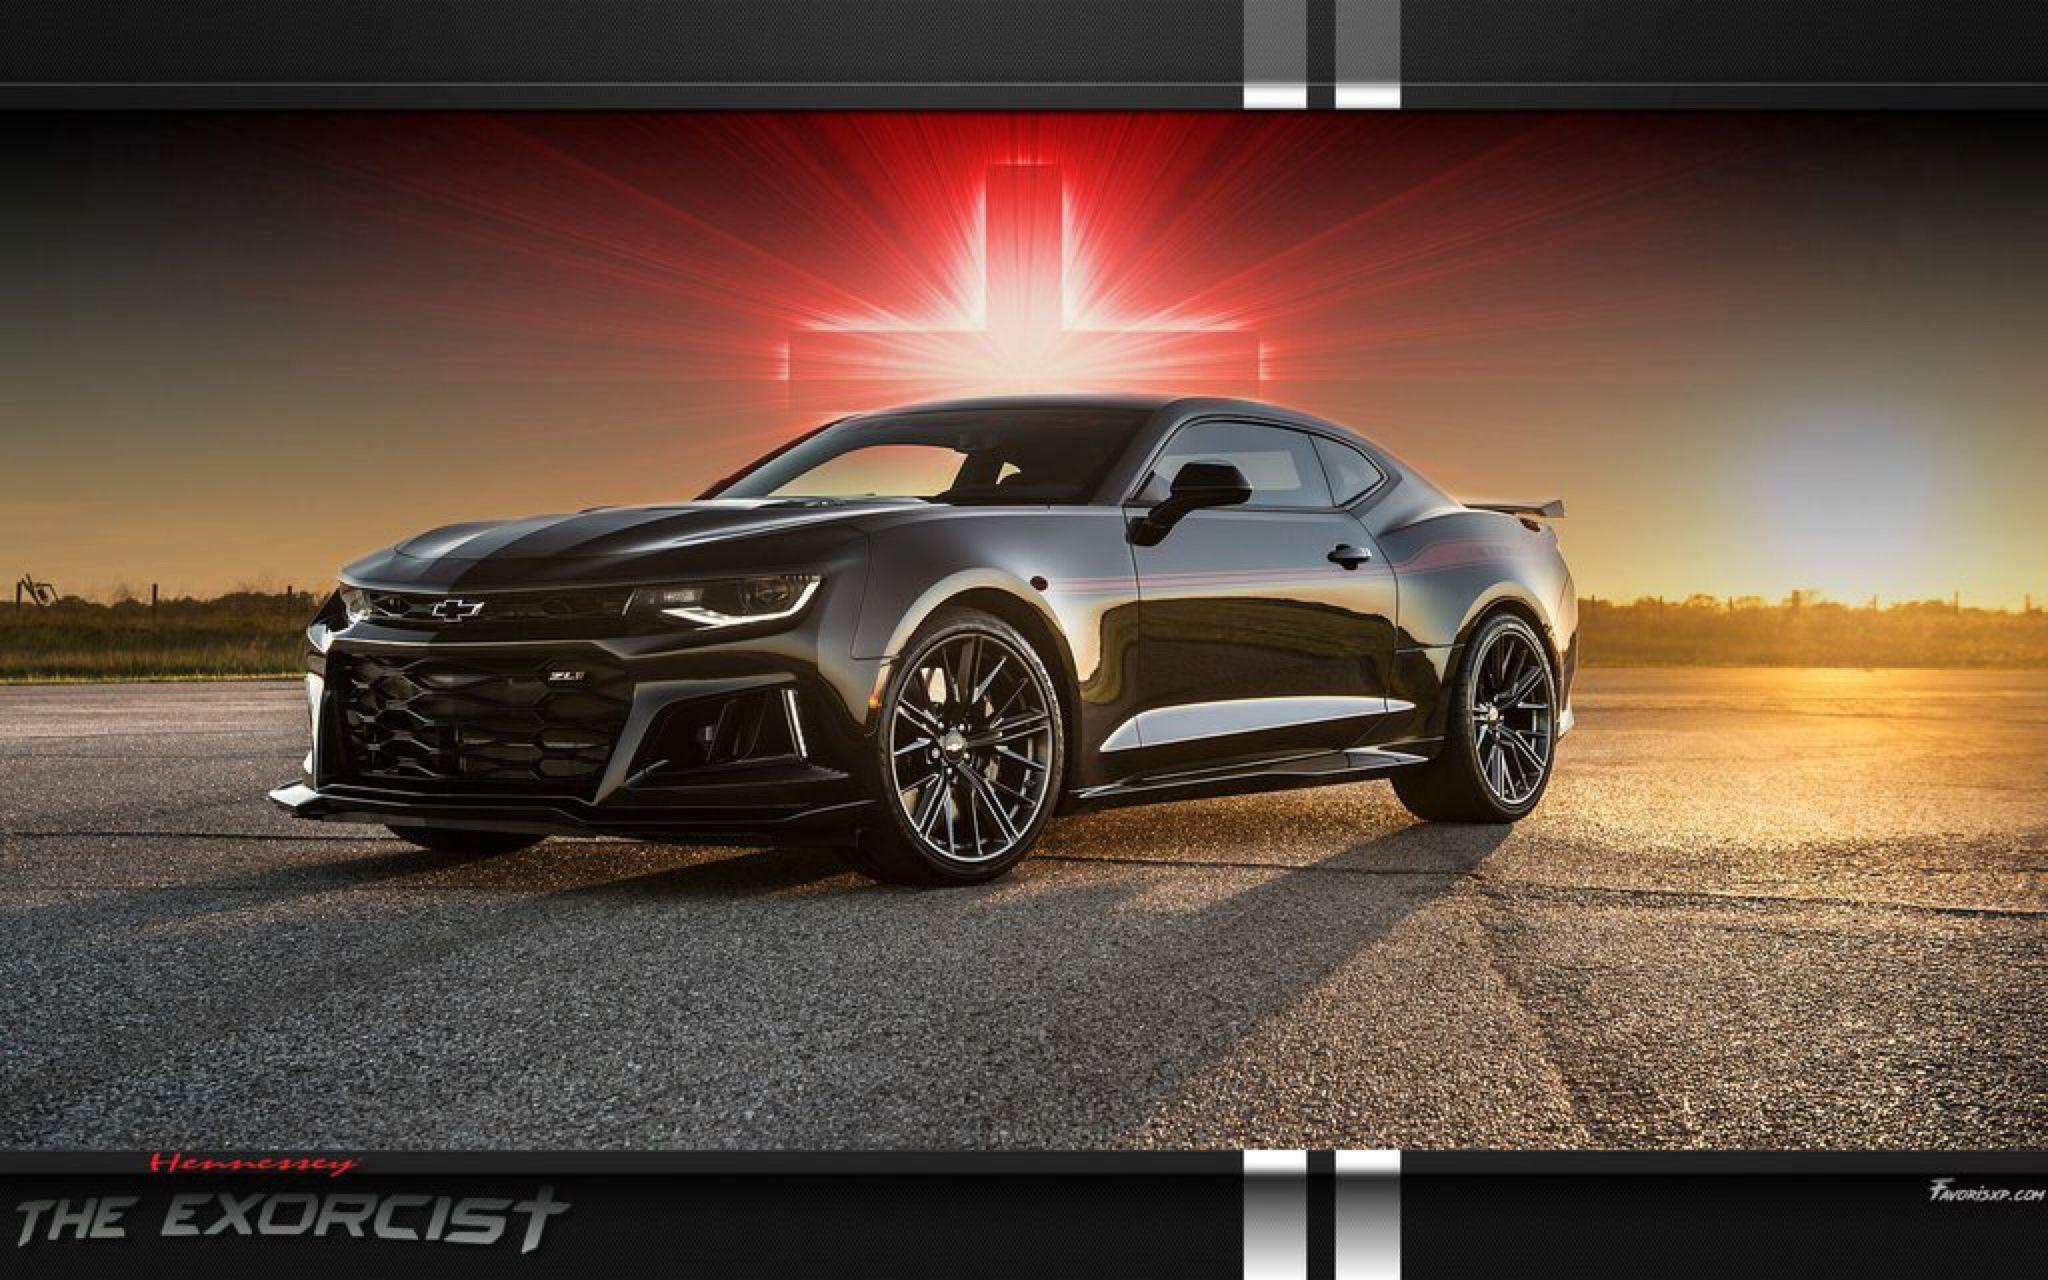 Wallpaper Chevrolet Camaro Zl1 Nascar Race Car 2017 4k: 66 Best Free Camaro ZL1 Wallpapers